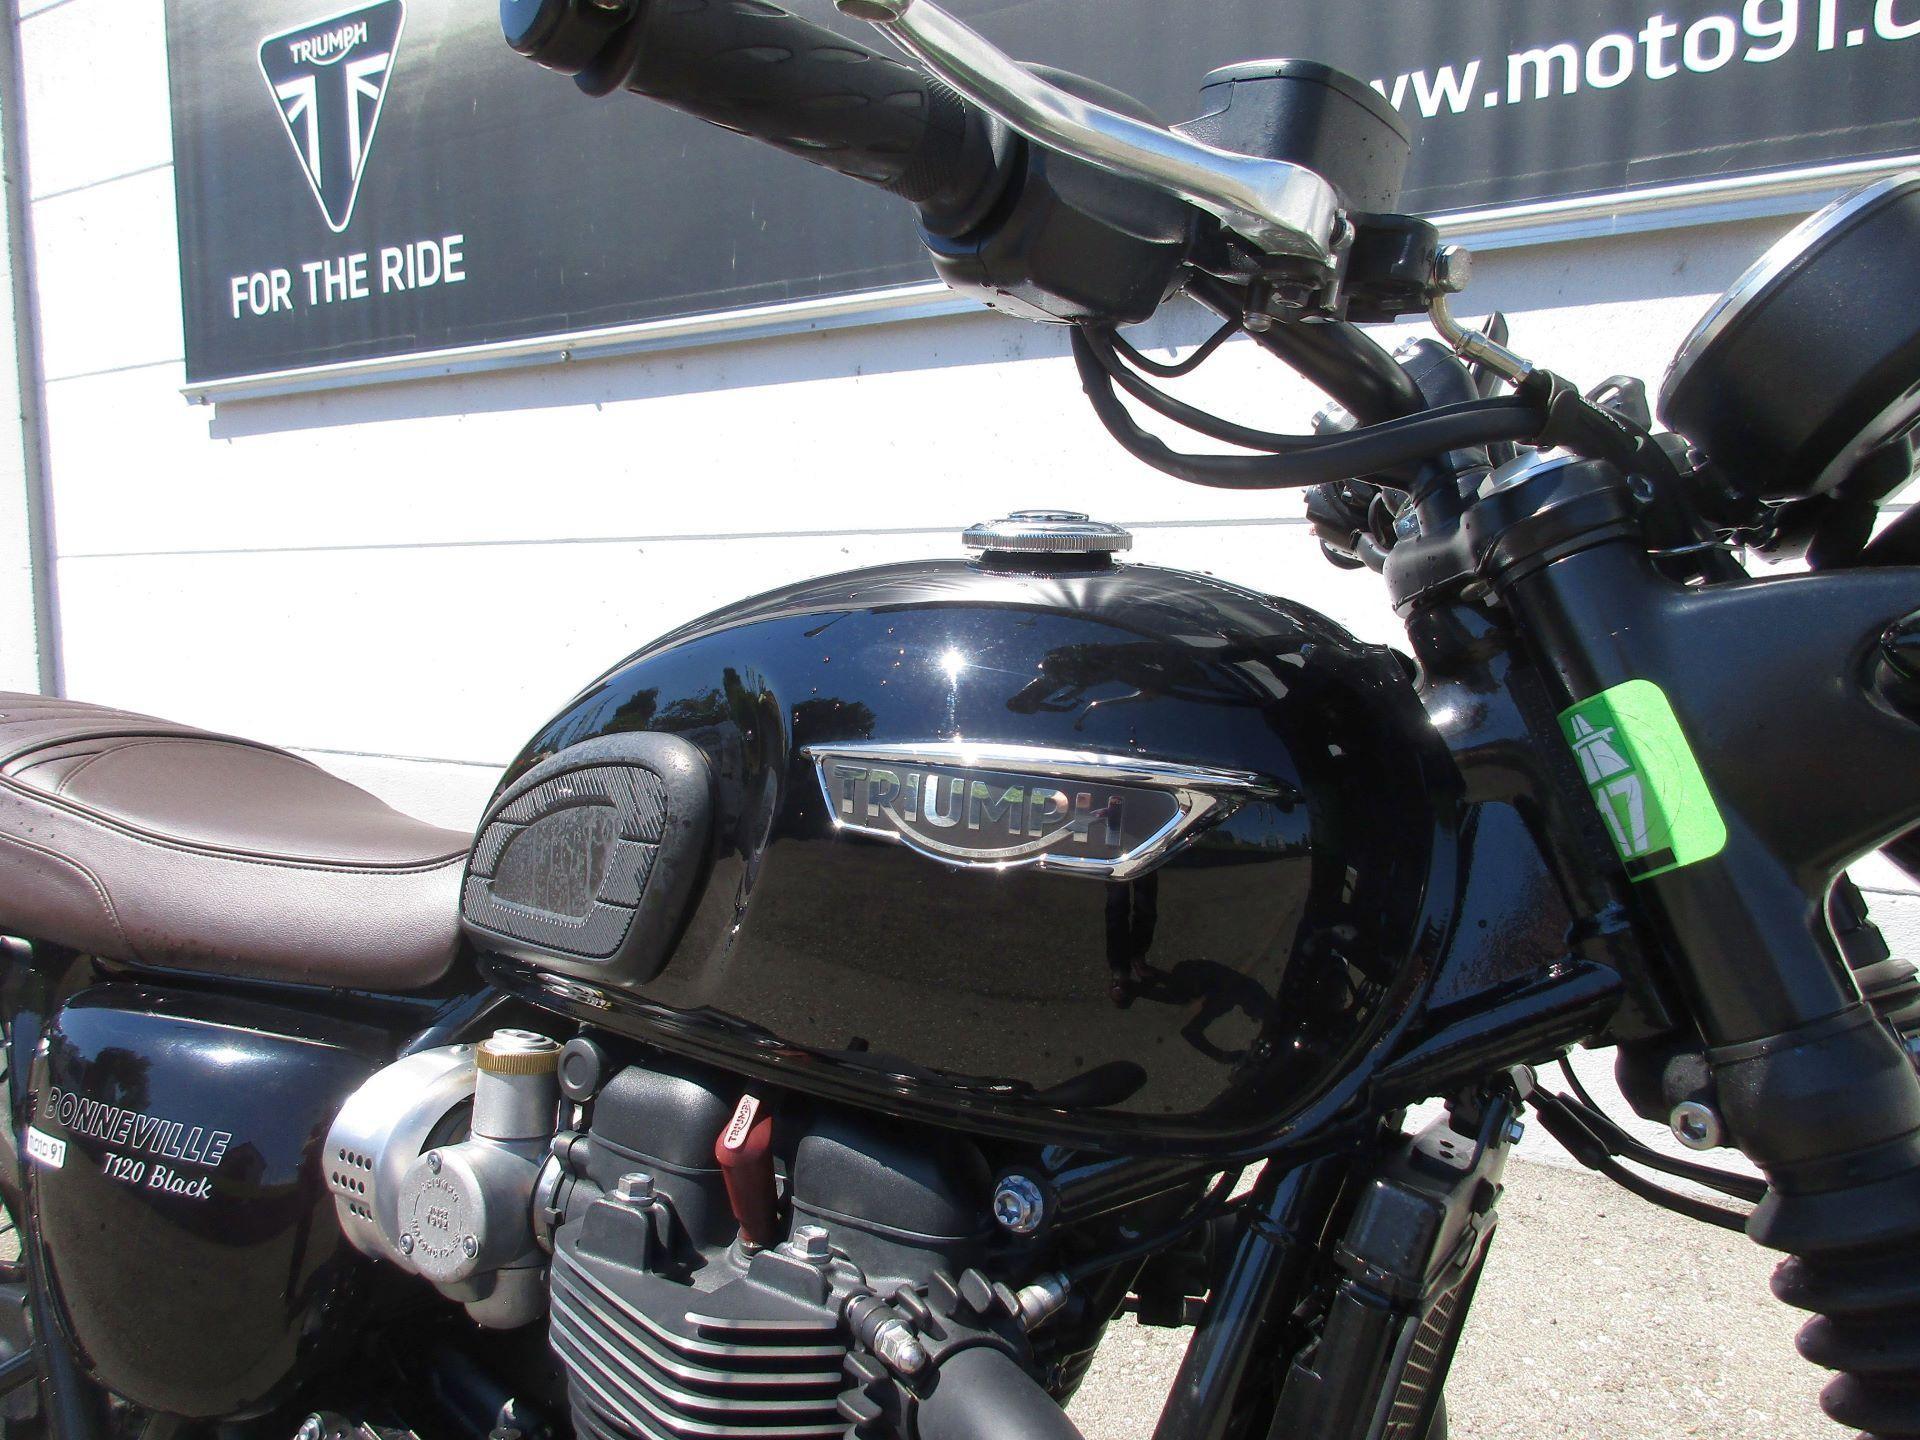 Triumph Bonneville Oldtimer Kaufen Motorrad Bild Idee